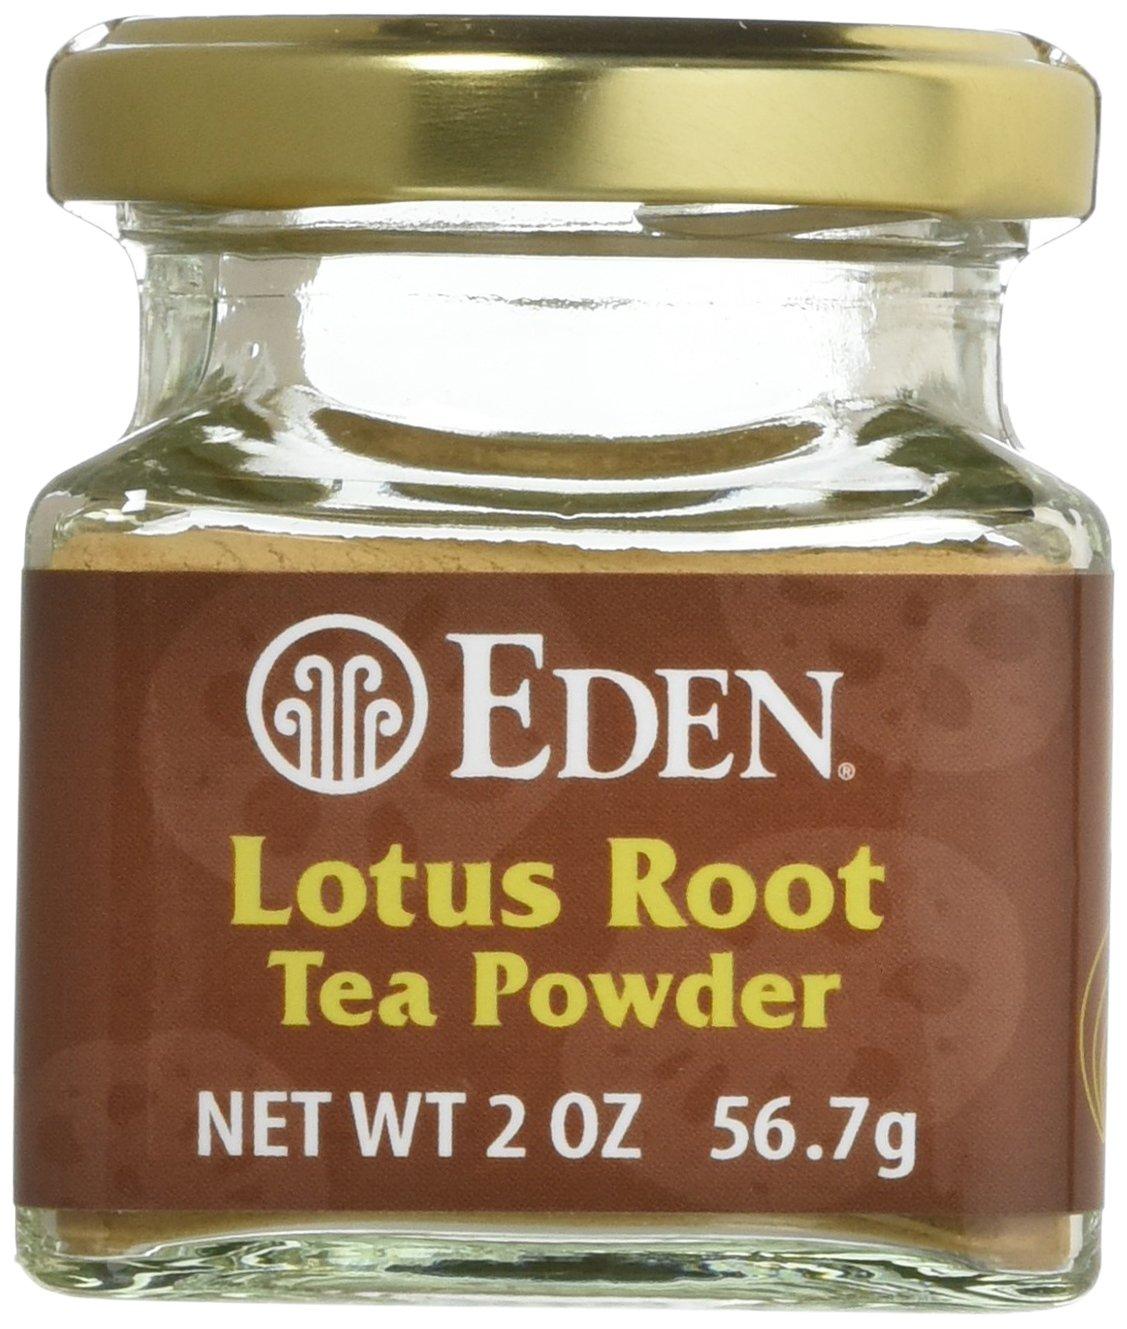 Eden Lotus Root Tea, 2 oz Glass Jar